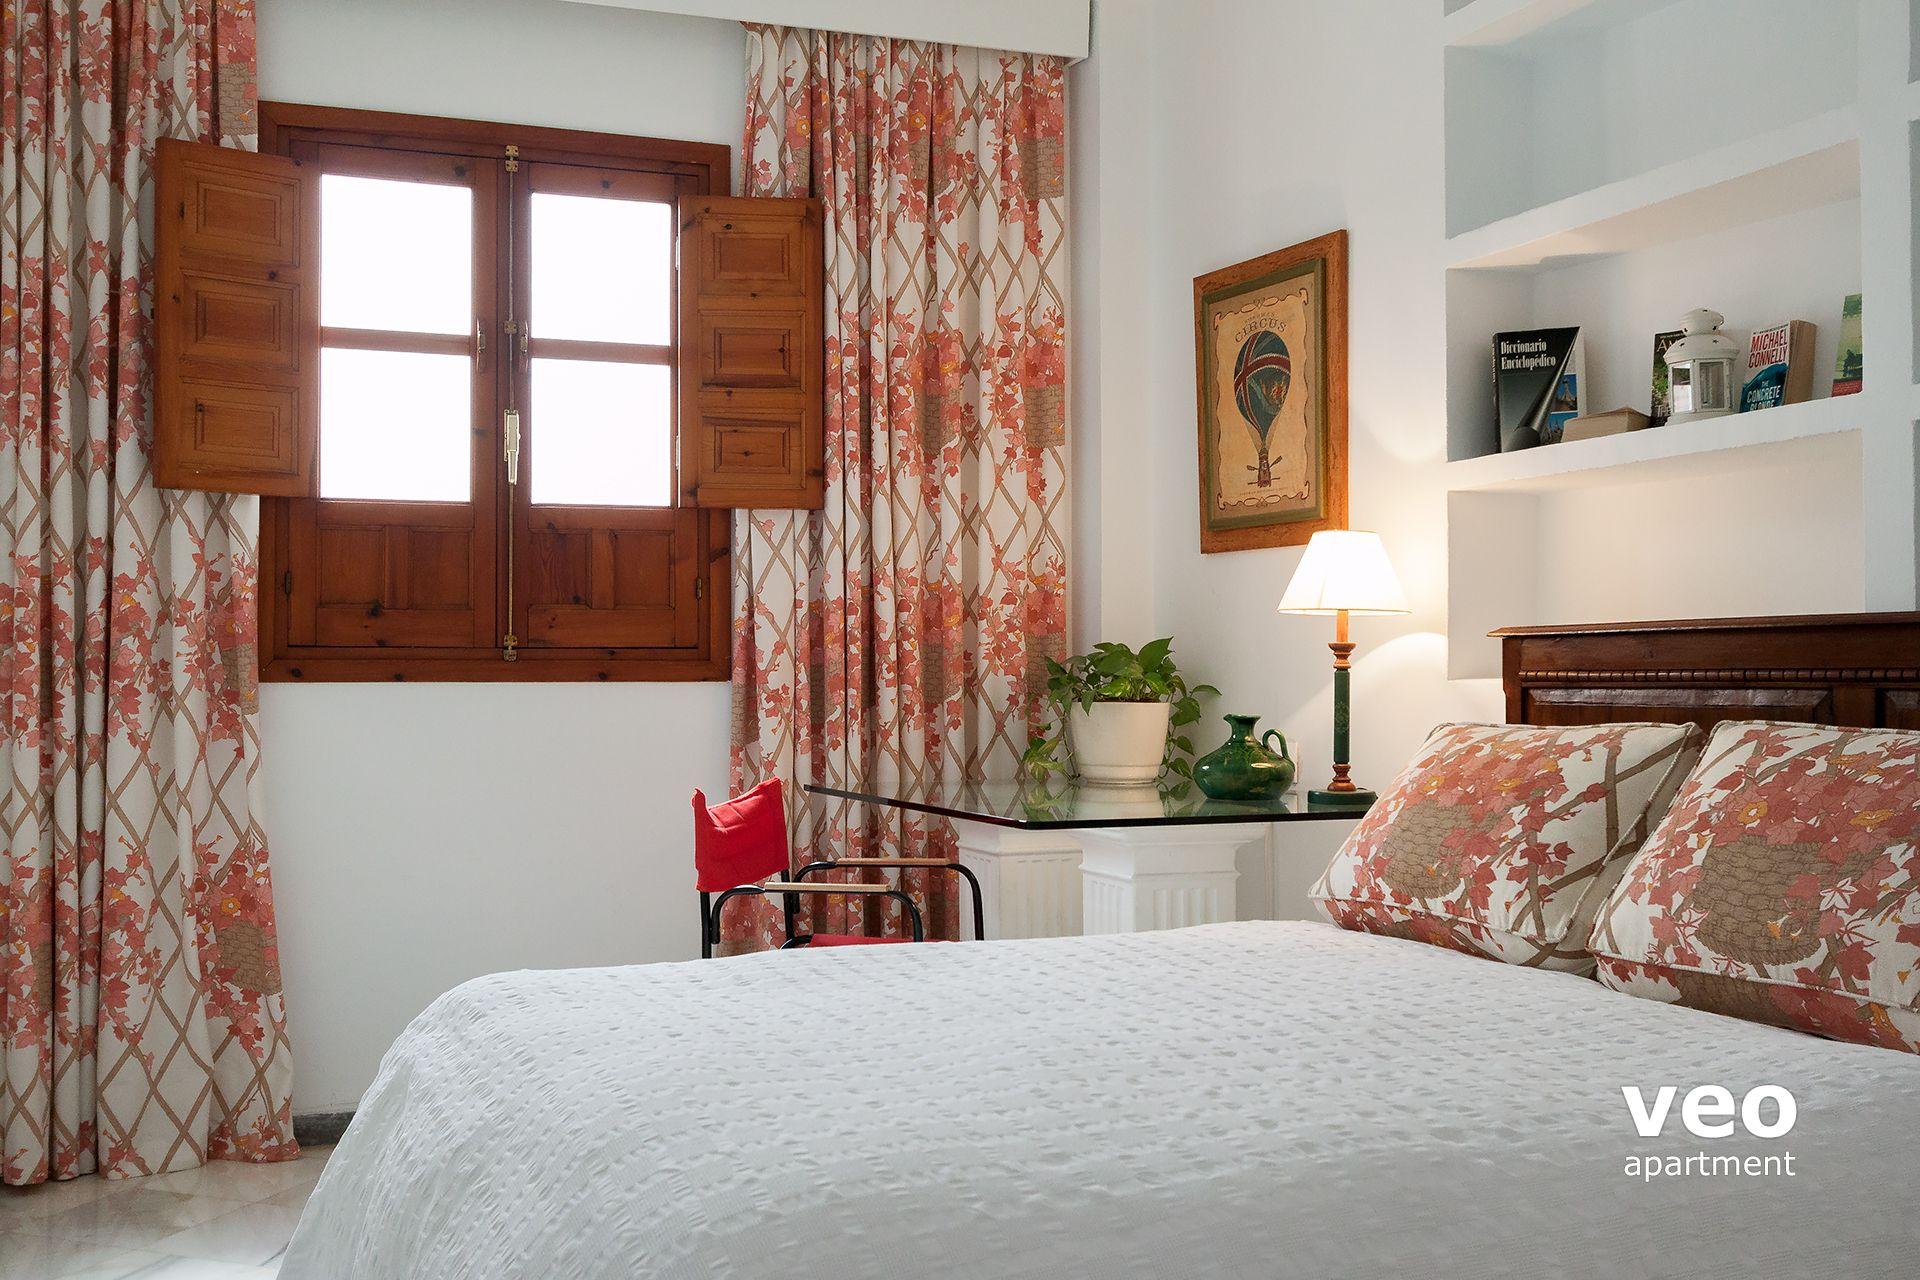 Seville Apartment Santa Cruz Square Seville Spain Plaza